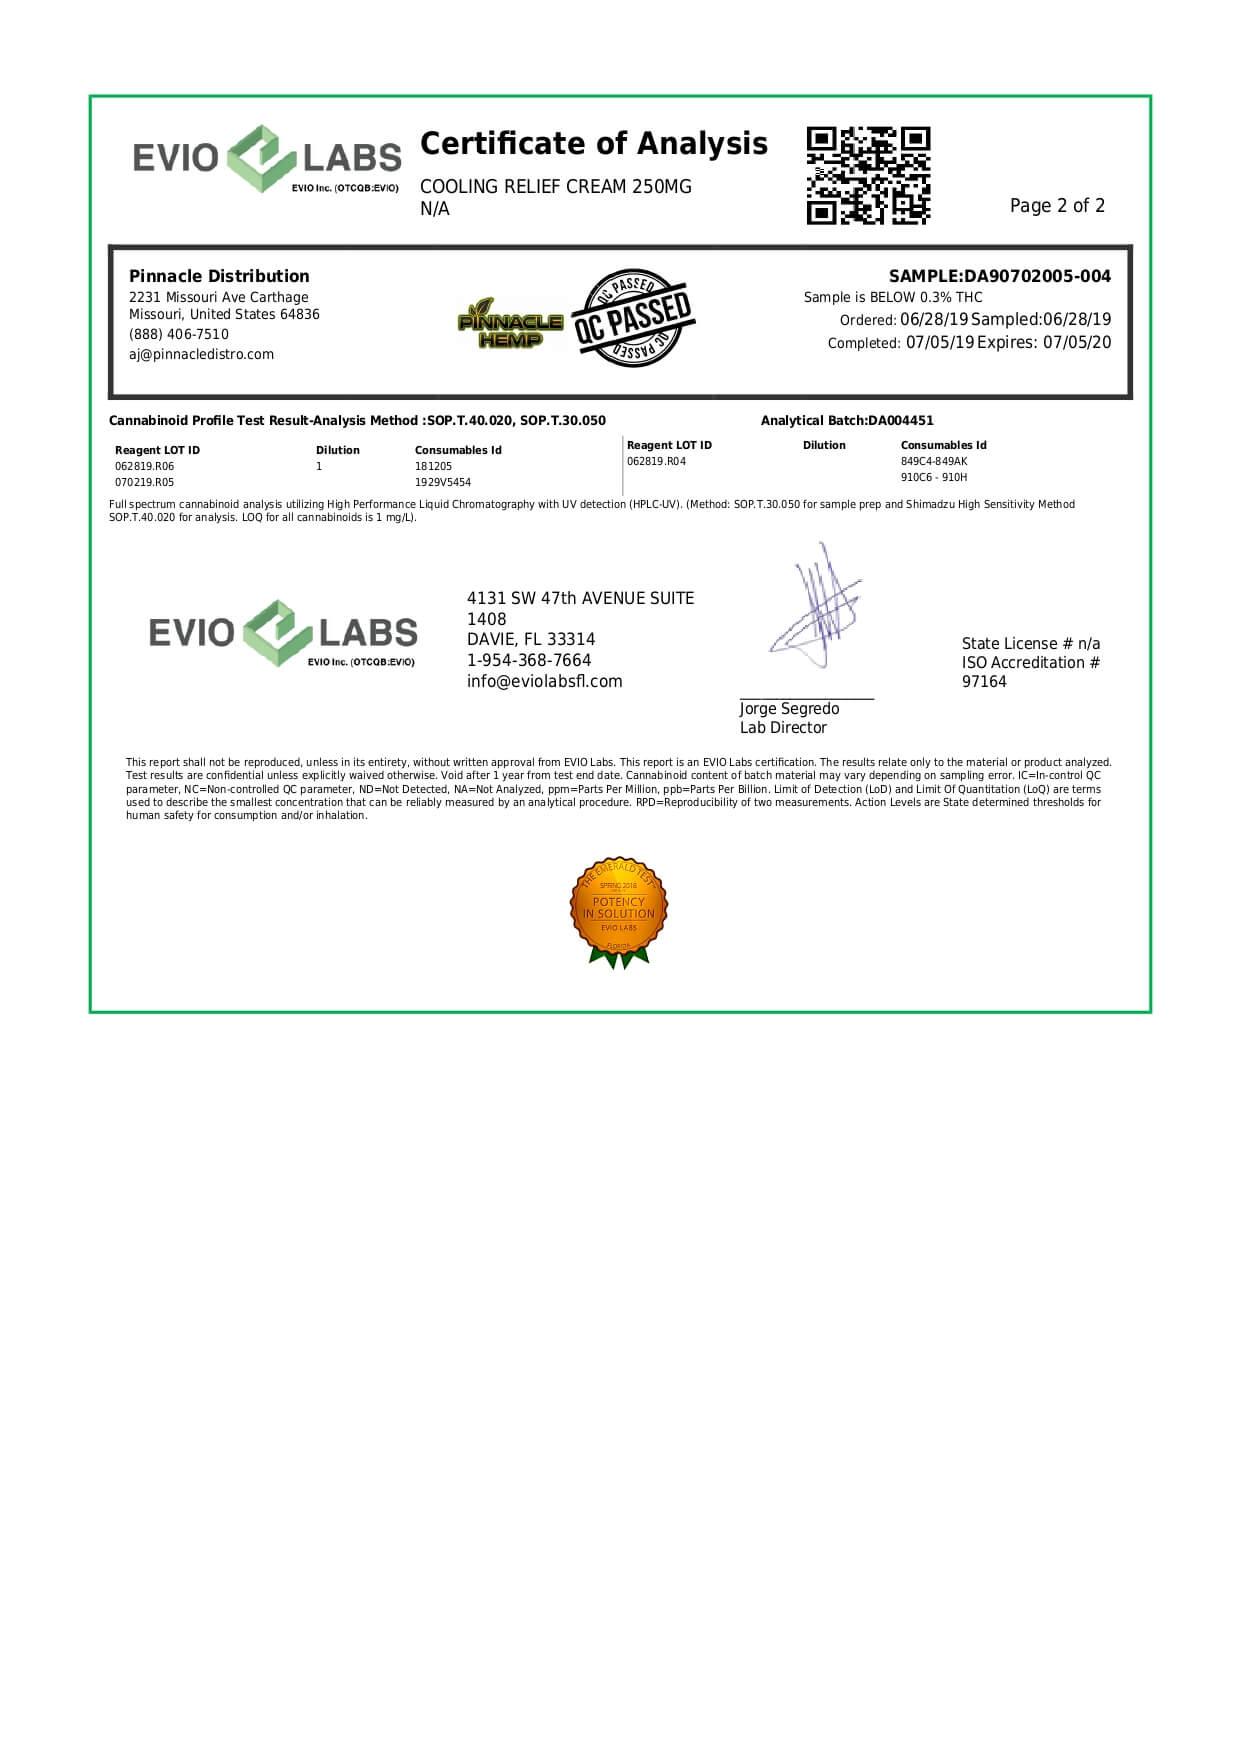 Pinnacle Hemp CBD Topical Relief Cream Cooling 250mg Lab Report